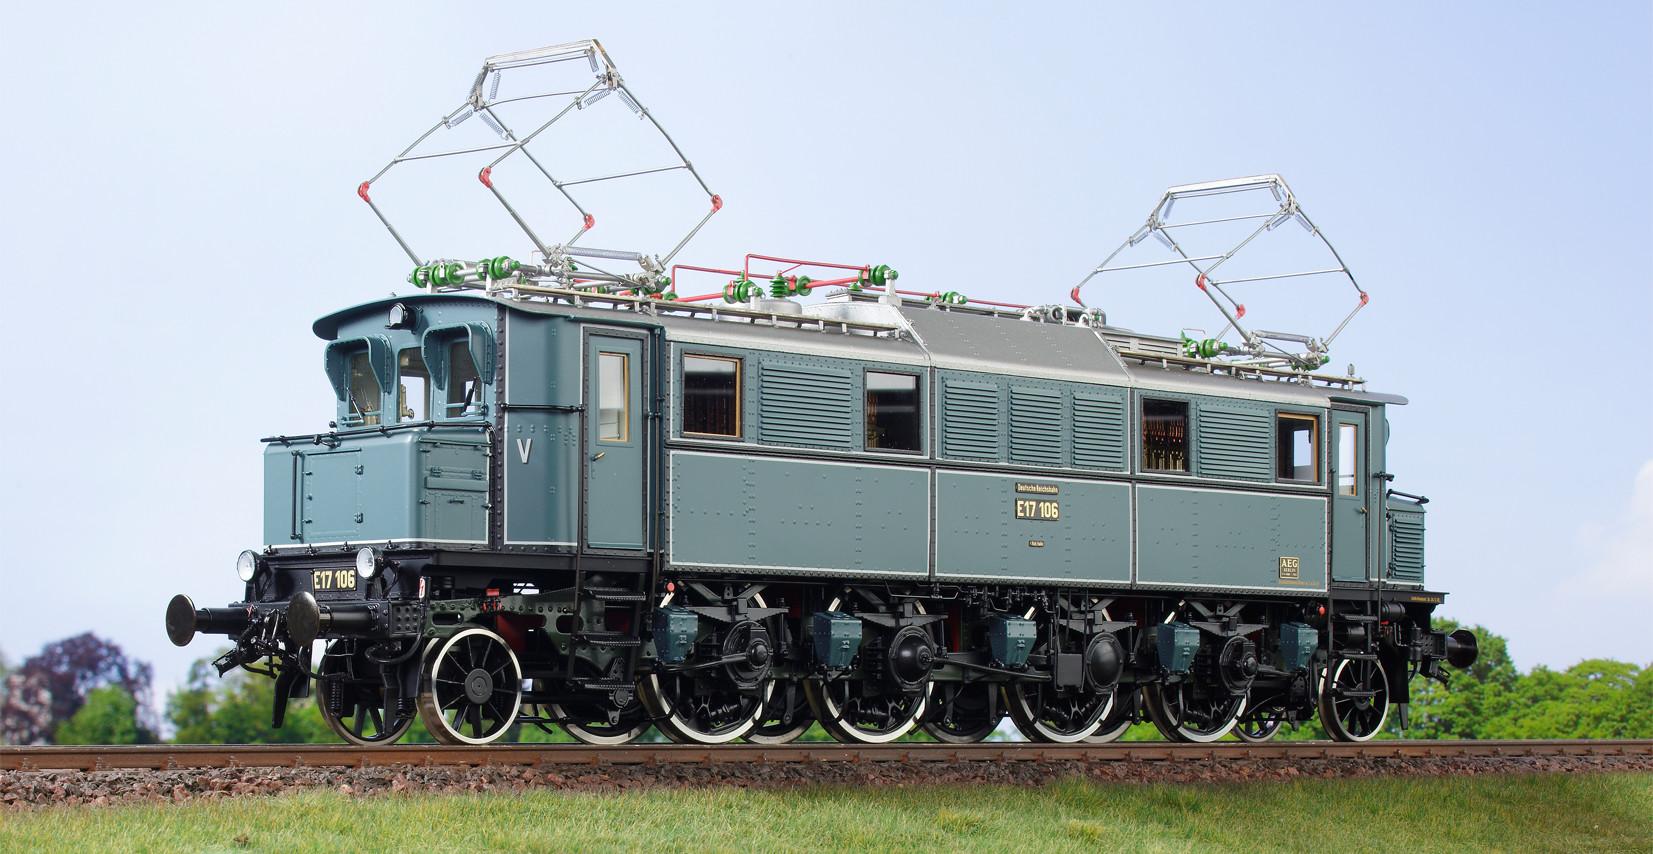 Spur 1 Lokomotive Baureihe E 17 106 Epoche IIb blaugrau